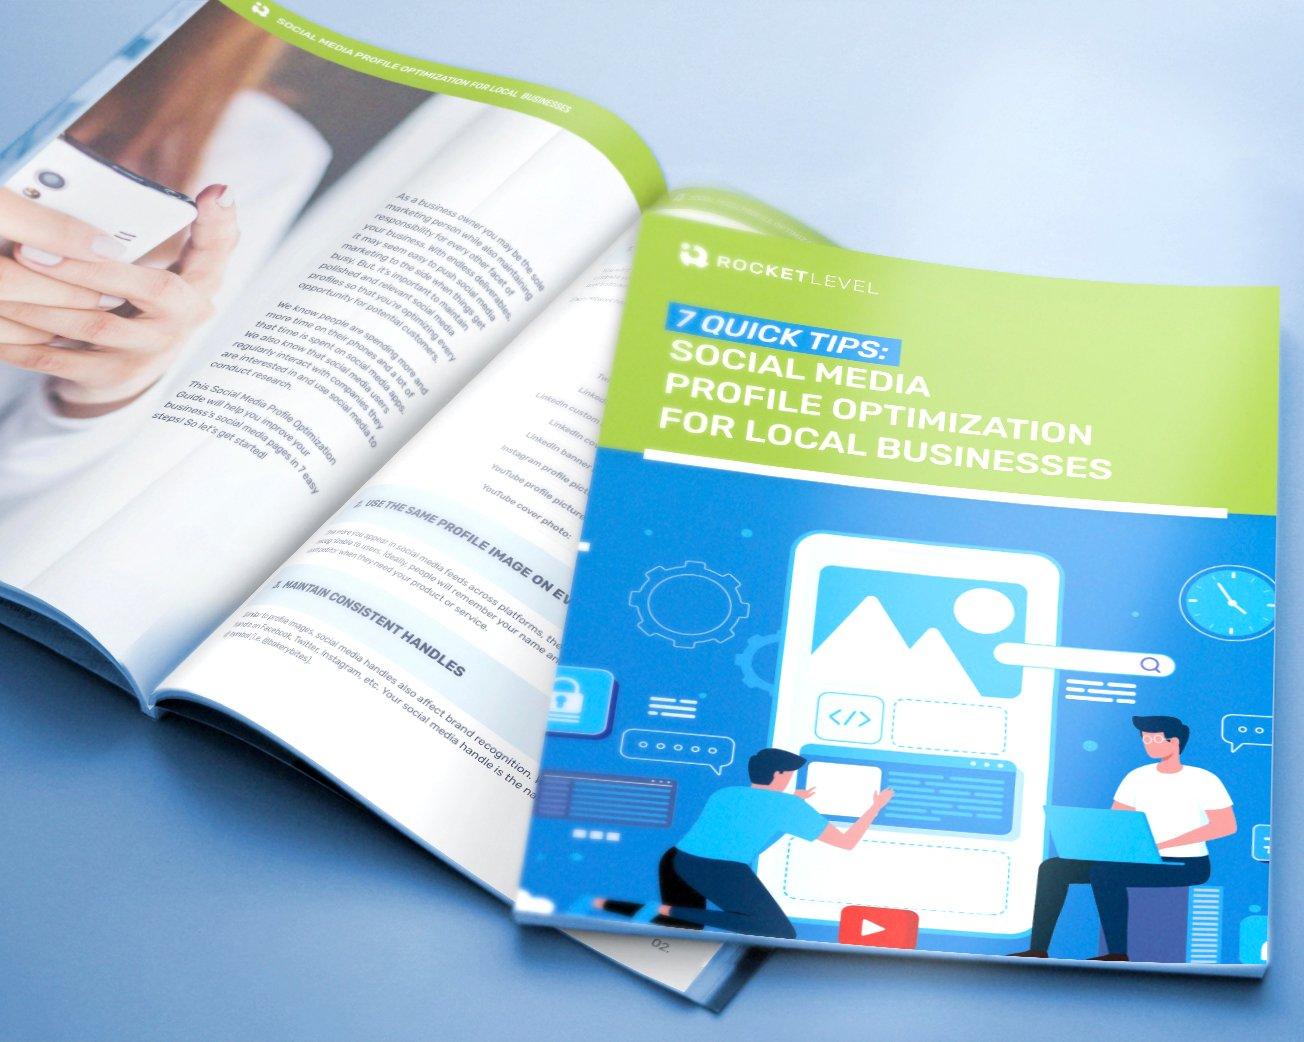 7 Quick Tips_ Social Media Profile Optimization for Local BusinessesLanding Header